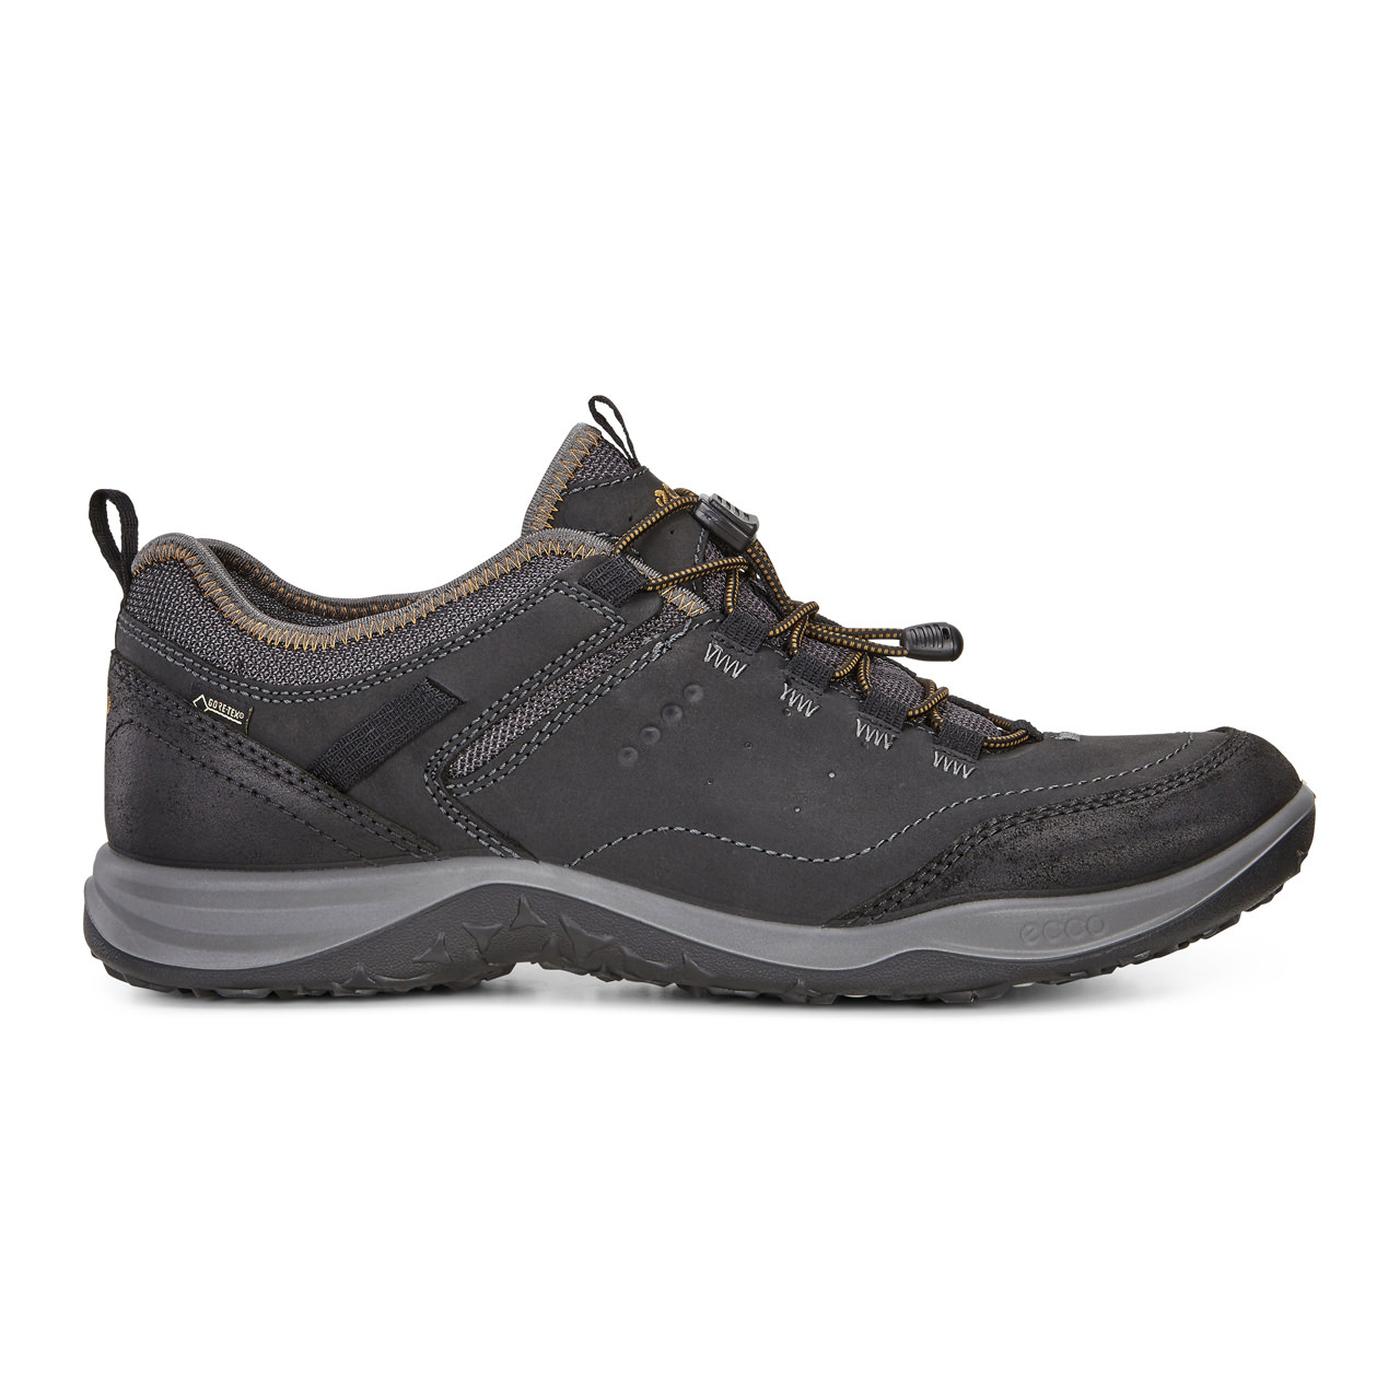 d99eaf37 ECCO Men's Espinho GTX | Hiking Shoes | ECCO® Shoes